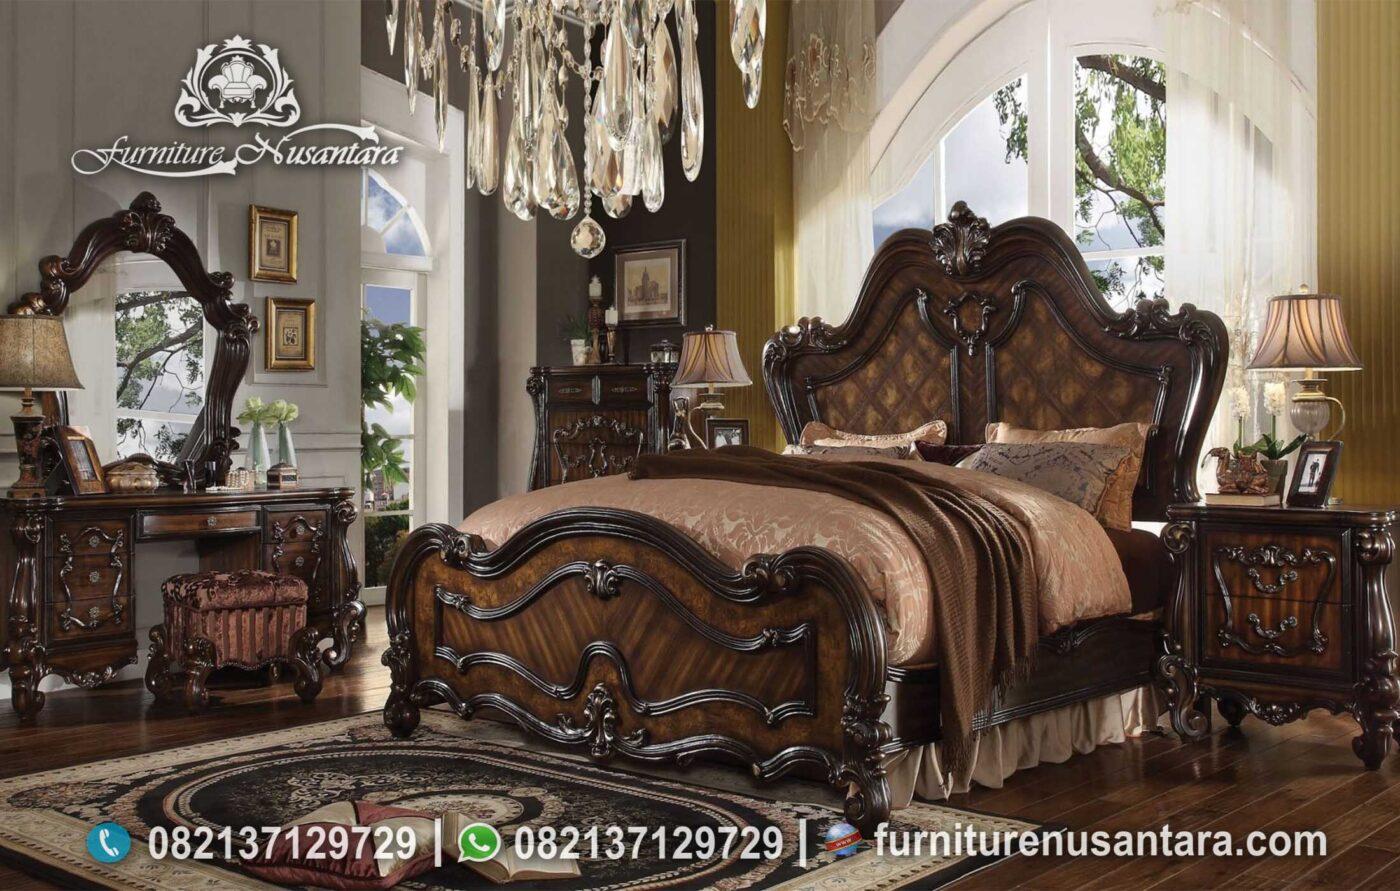 Kamar Tidur Natural Estetis Klasik Wallnut KS-174, Furniture Nusantara